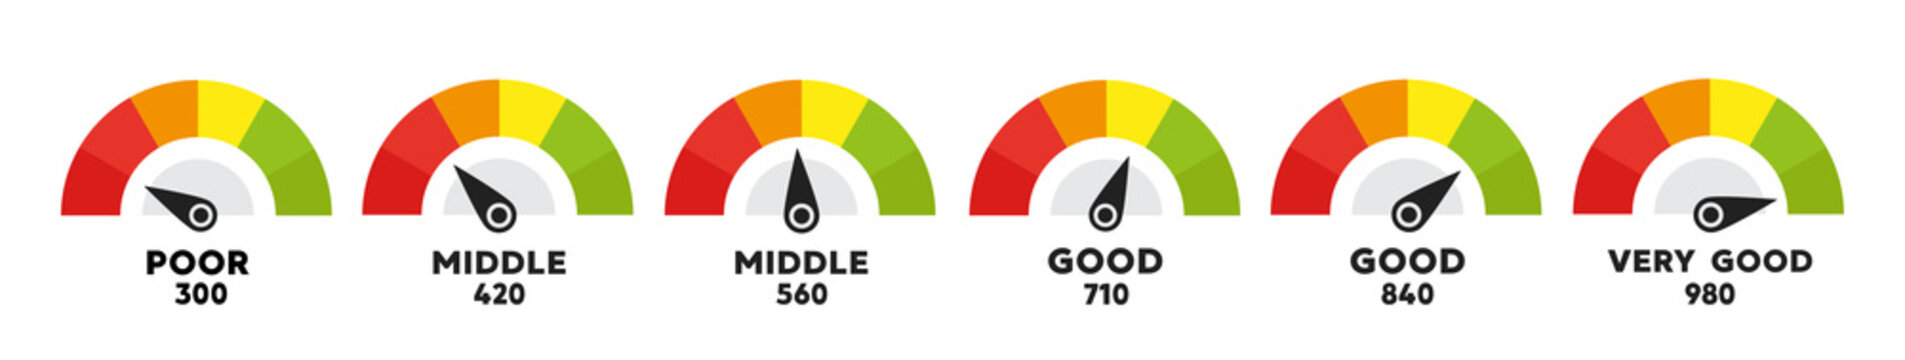 Credit score indicators set. Vector illustration